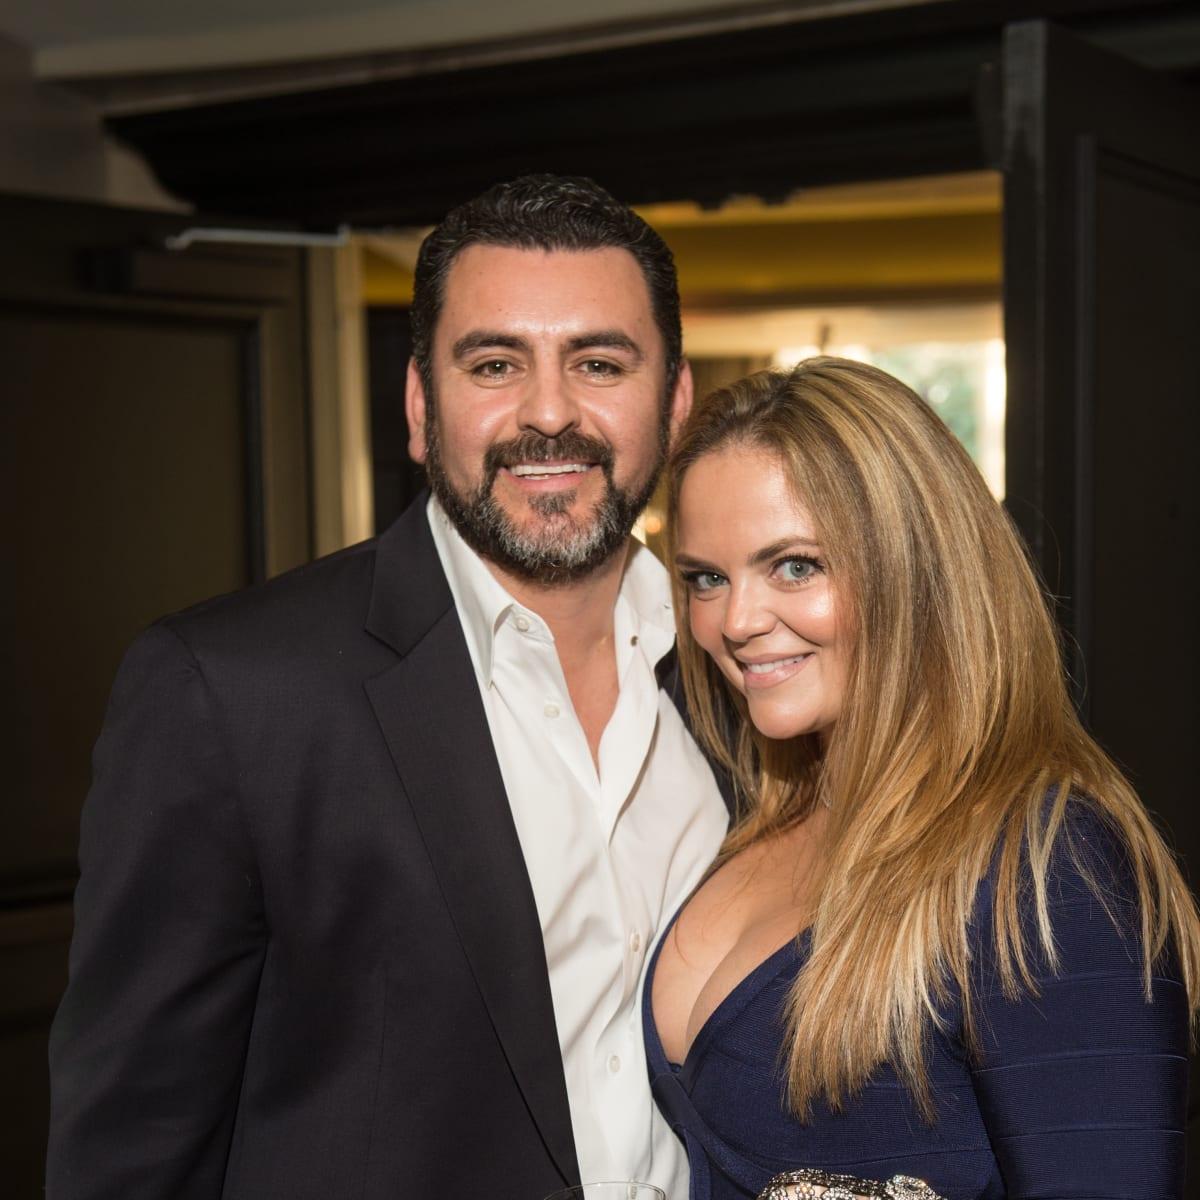 Be An Angel gala 5/16. Frank Rivera, Connie Zubizarreta